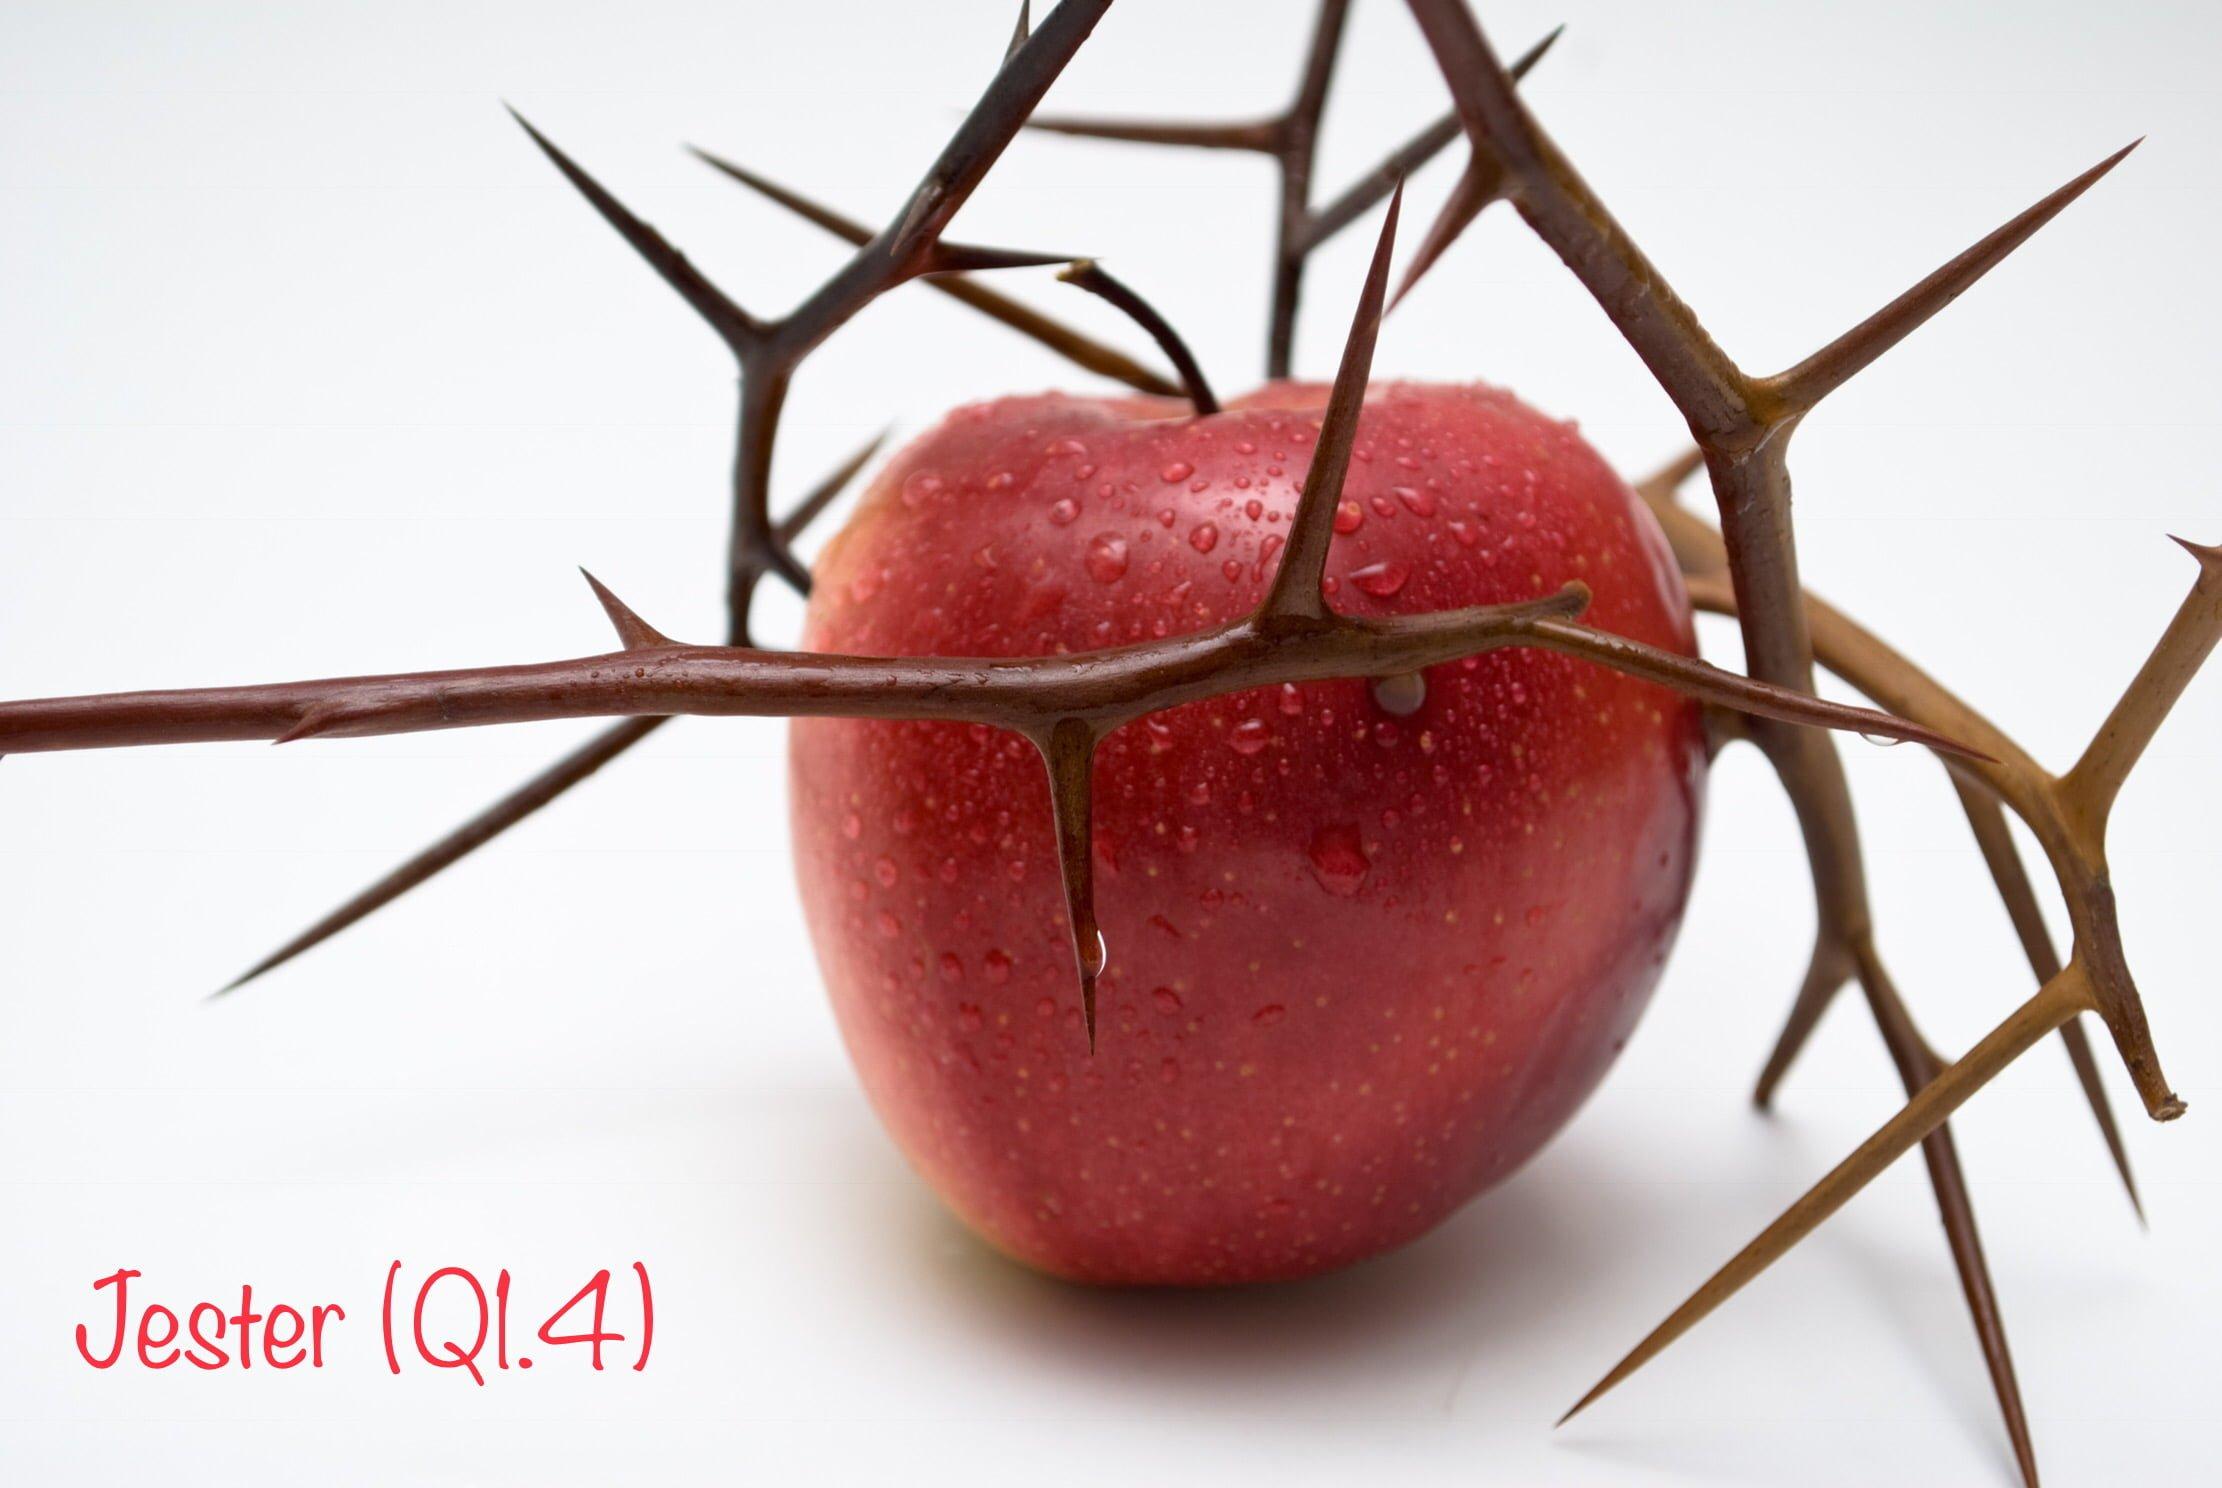 JESTER (Q1.4)